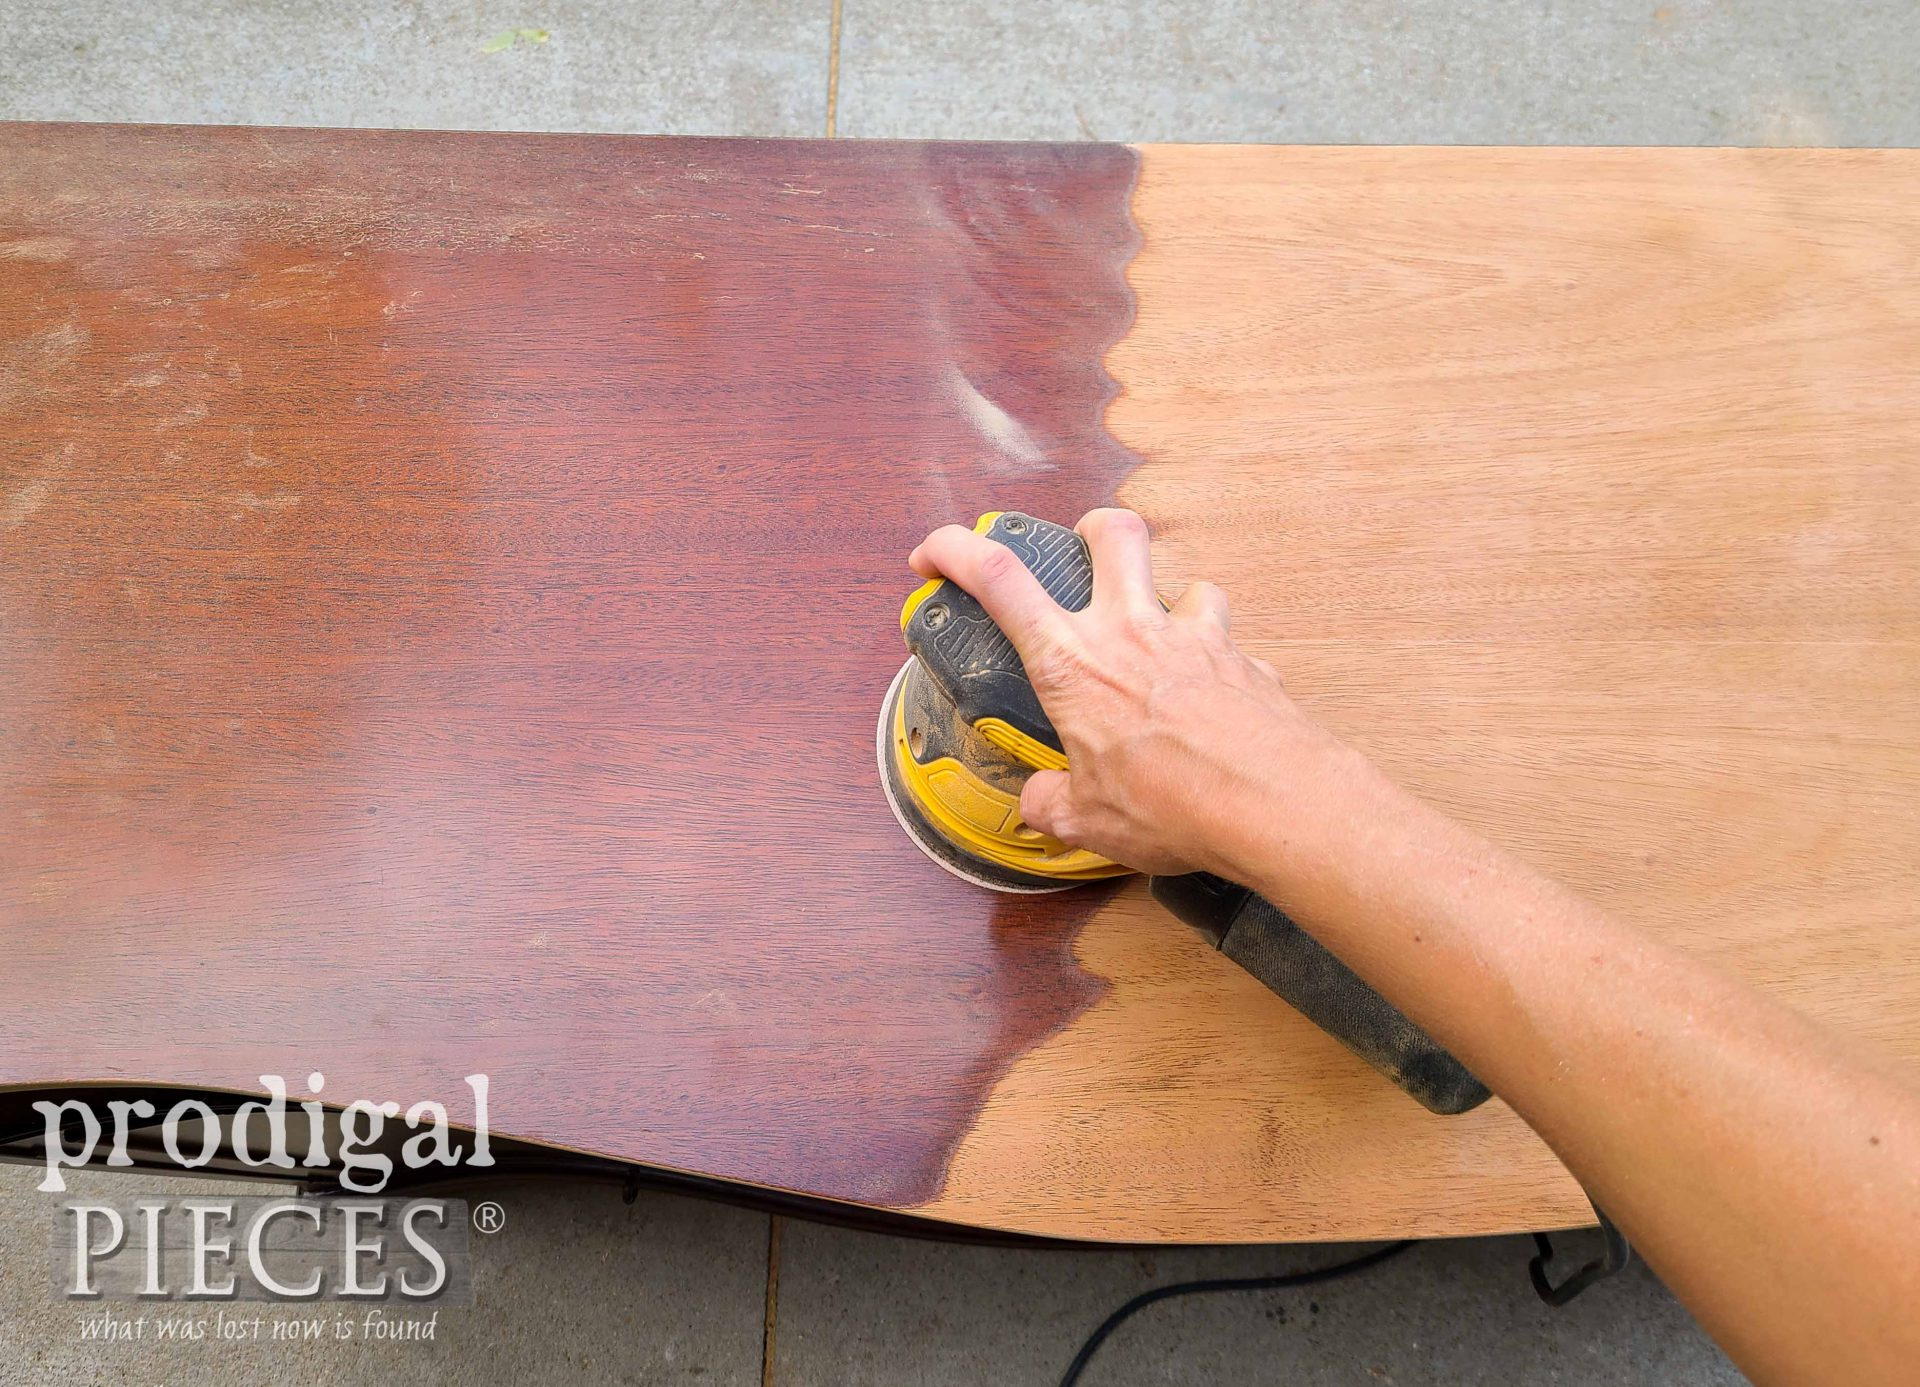 Sanding Buffet Top with Dewalt Orbital Sander by Prodigal Pieces | prodigalpieces.com